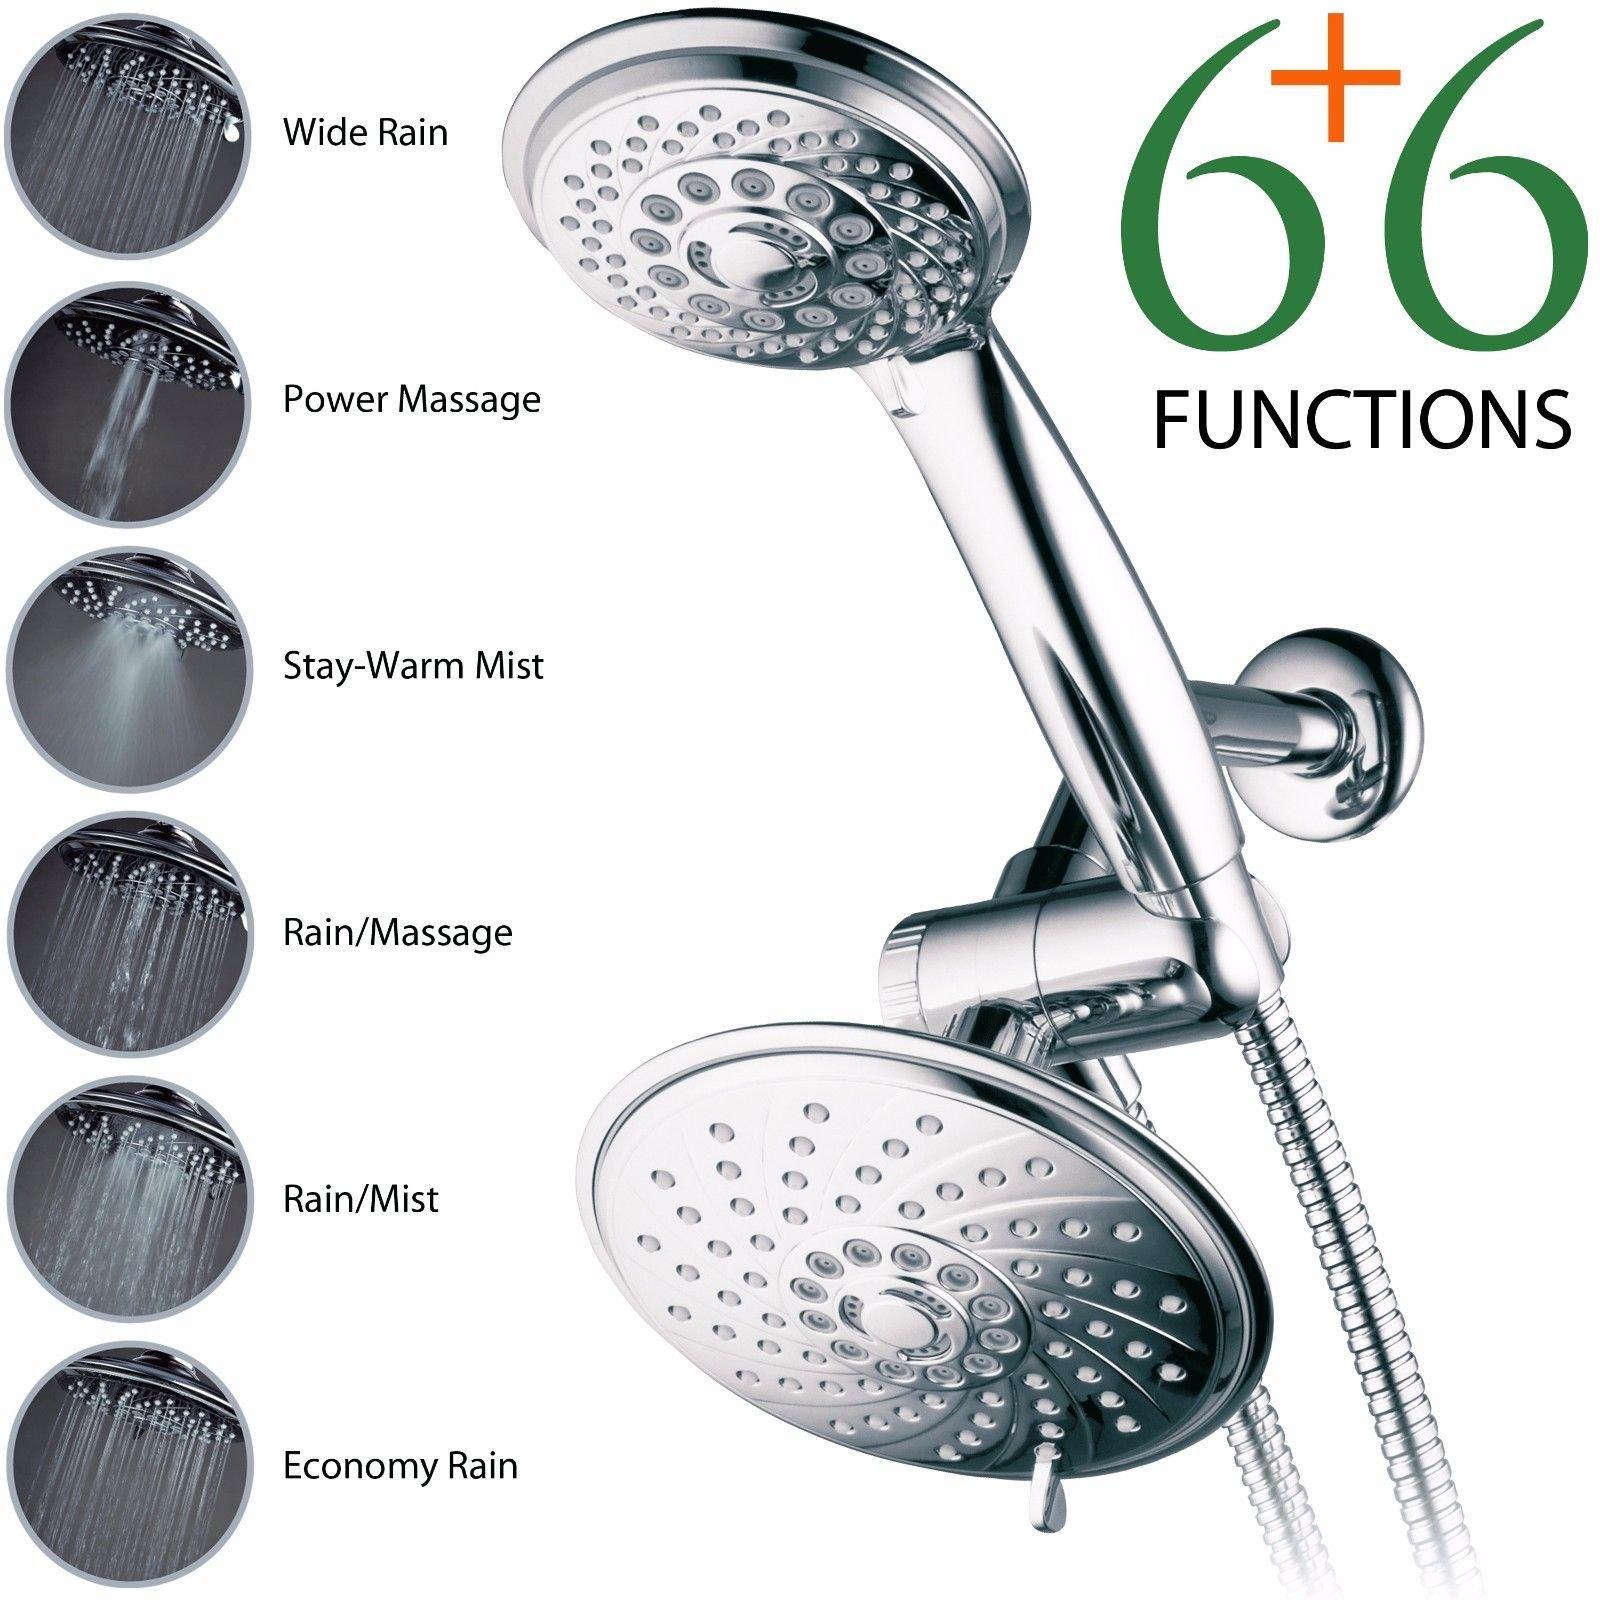 Ultra-Luxury 30-Setting 3-Way Rainfall Shower Head Combo